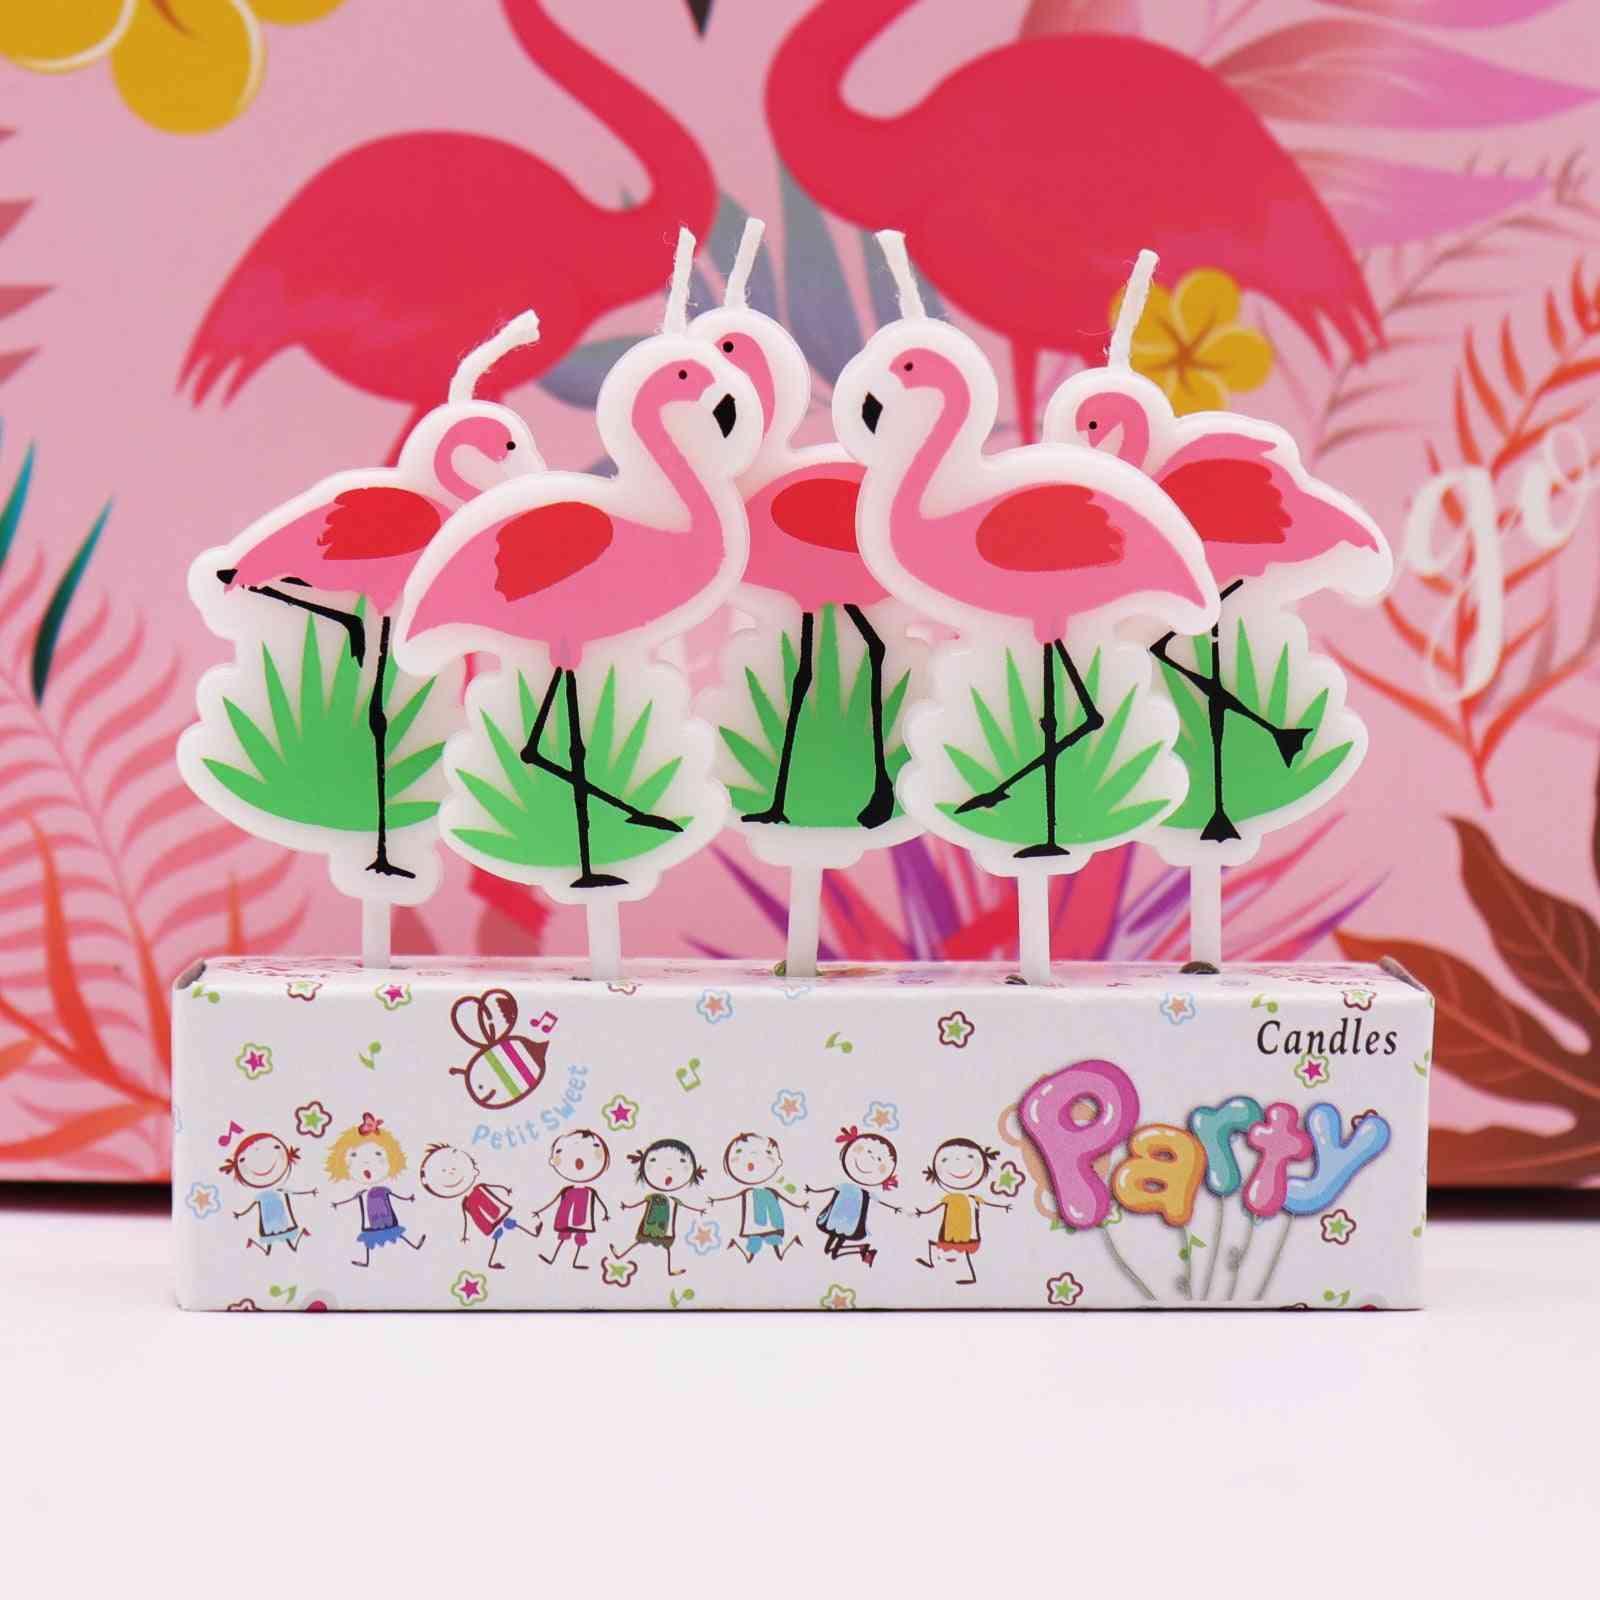 5pcs Cartoon Unicorn/flamingo Candles - Birthday Party, Baby Shower, Kids Party